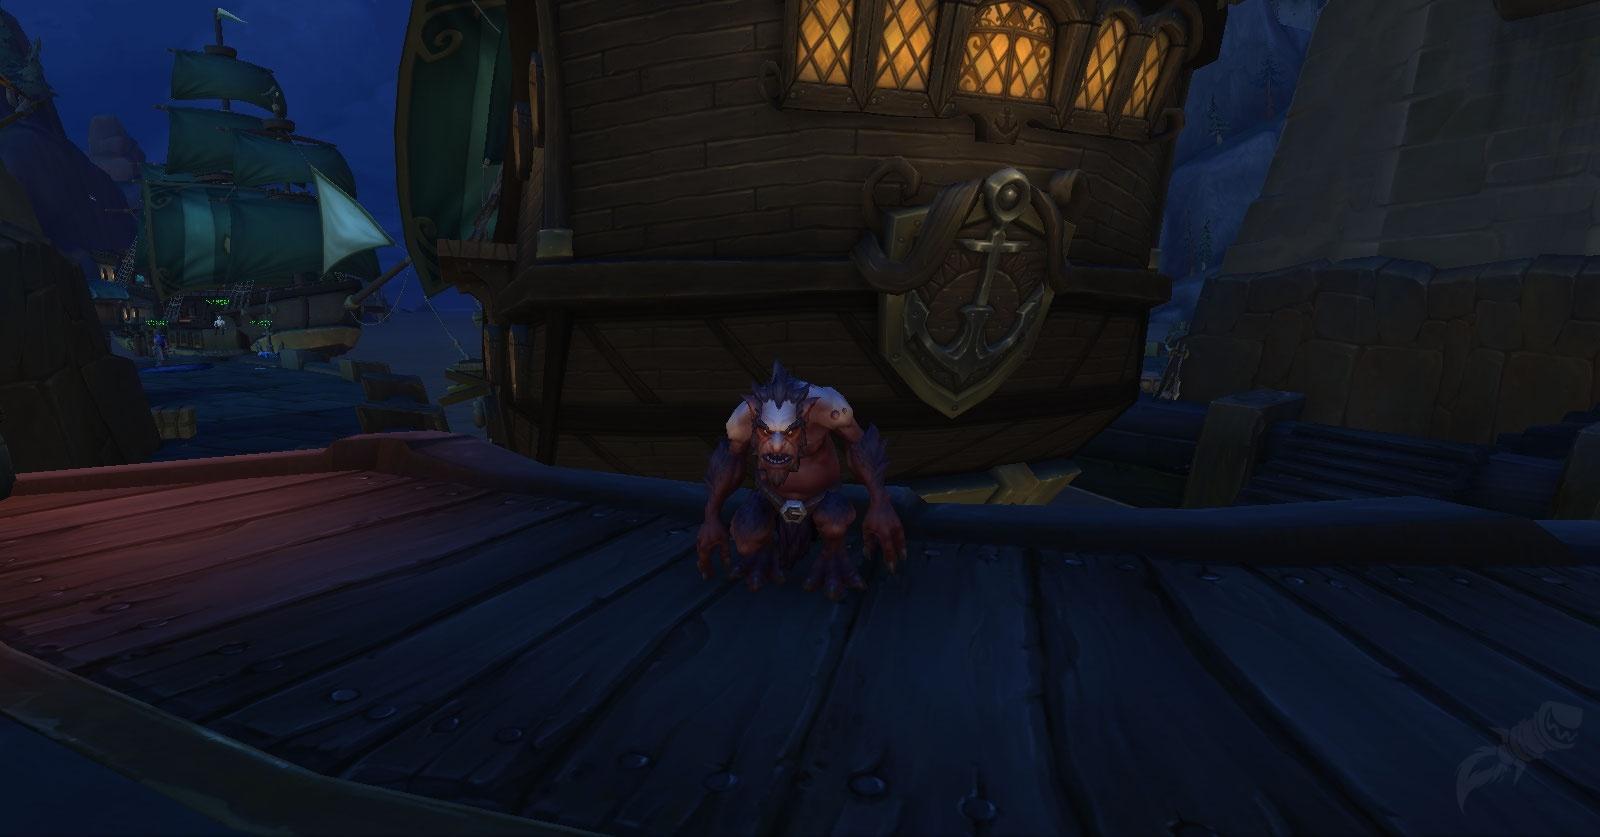 Carte Au Tresor Grabuge Sur Lile Des Sables Noirs.Enchanted Soup Stone Objet World Of Warcraft